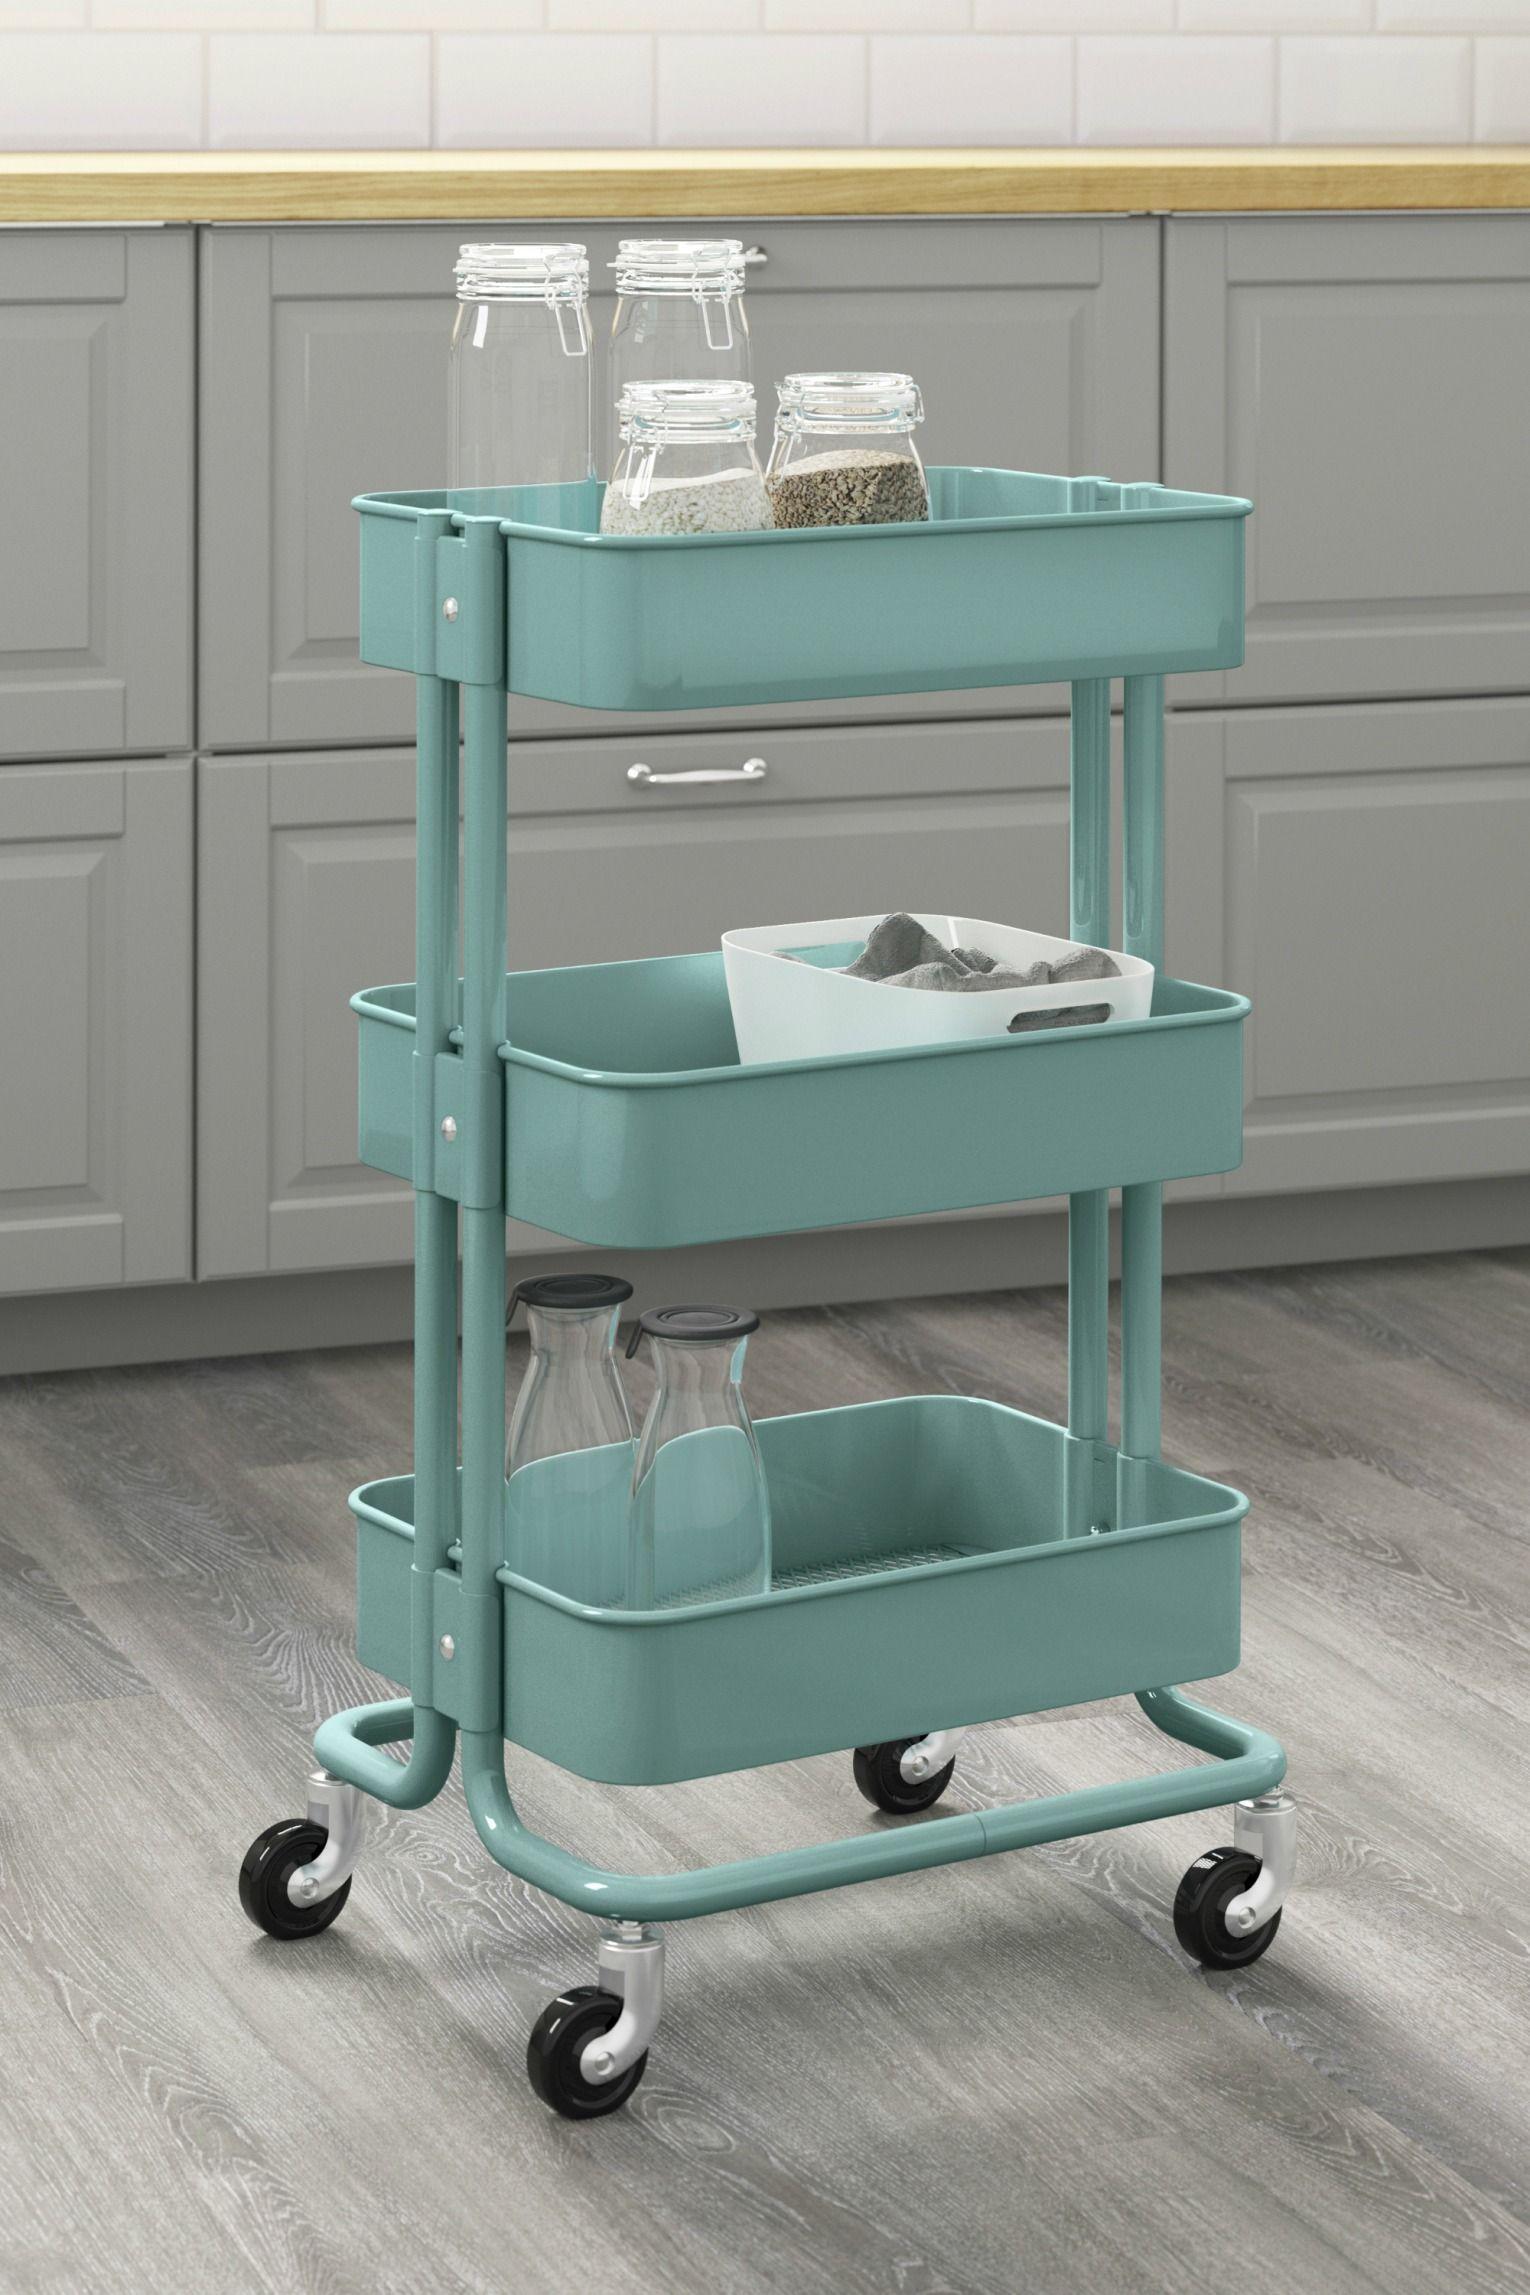 Home organization made easy! The IKEA RÅSKOG utility cart has three ...